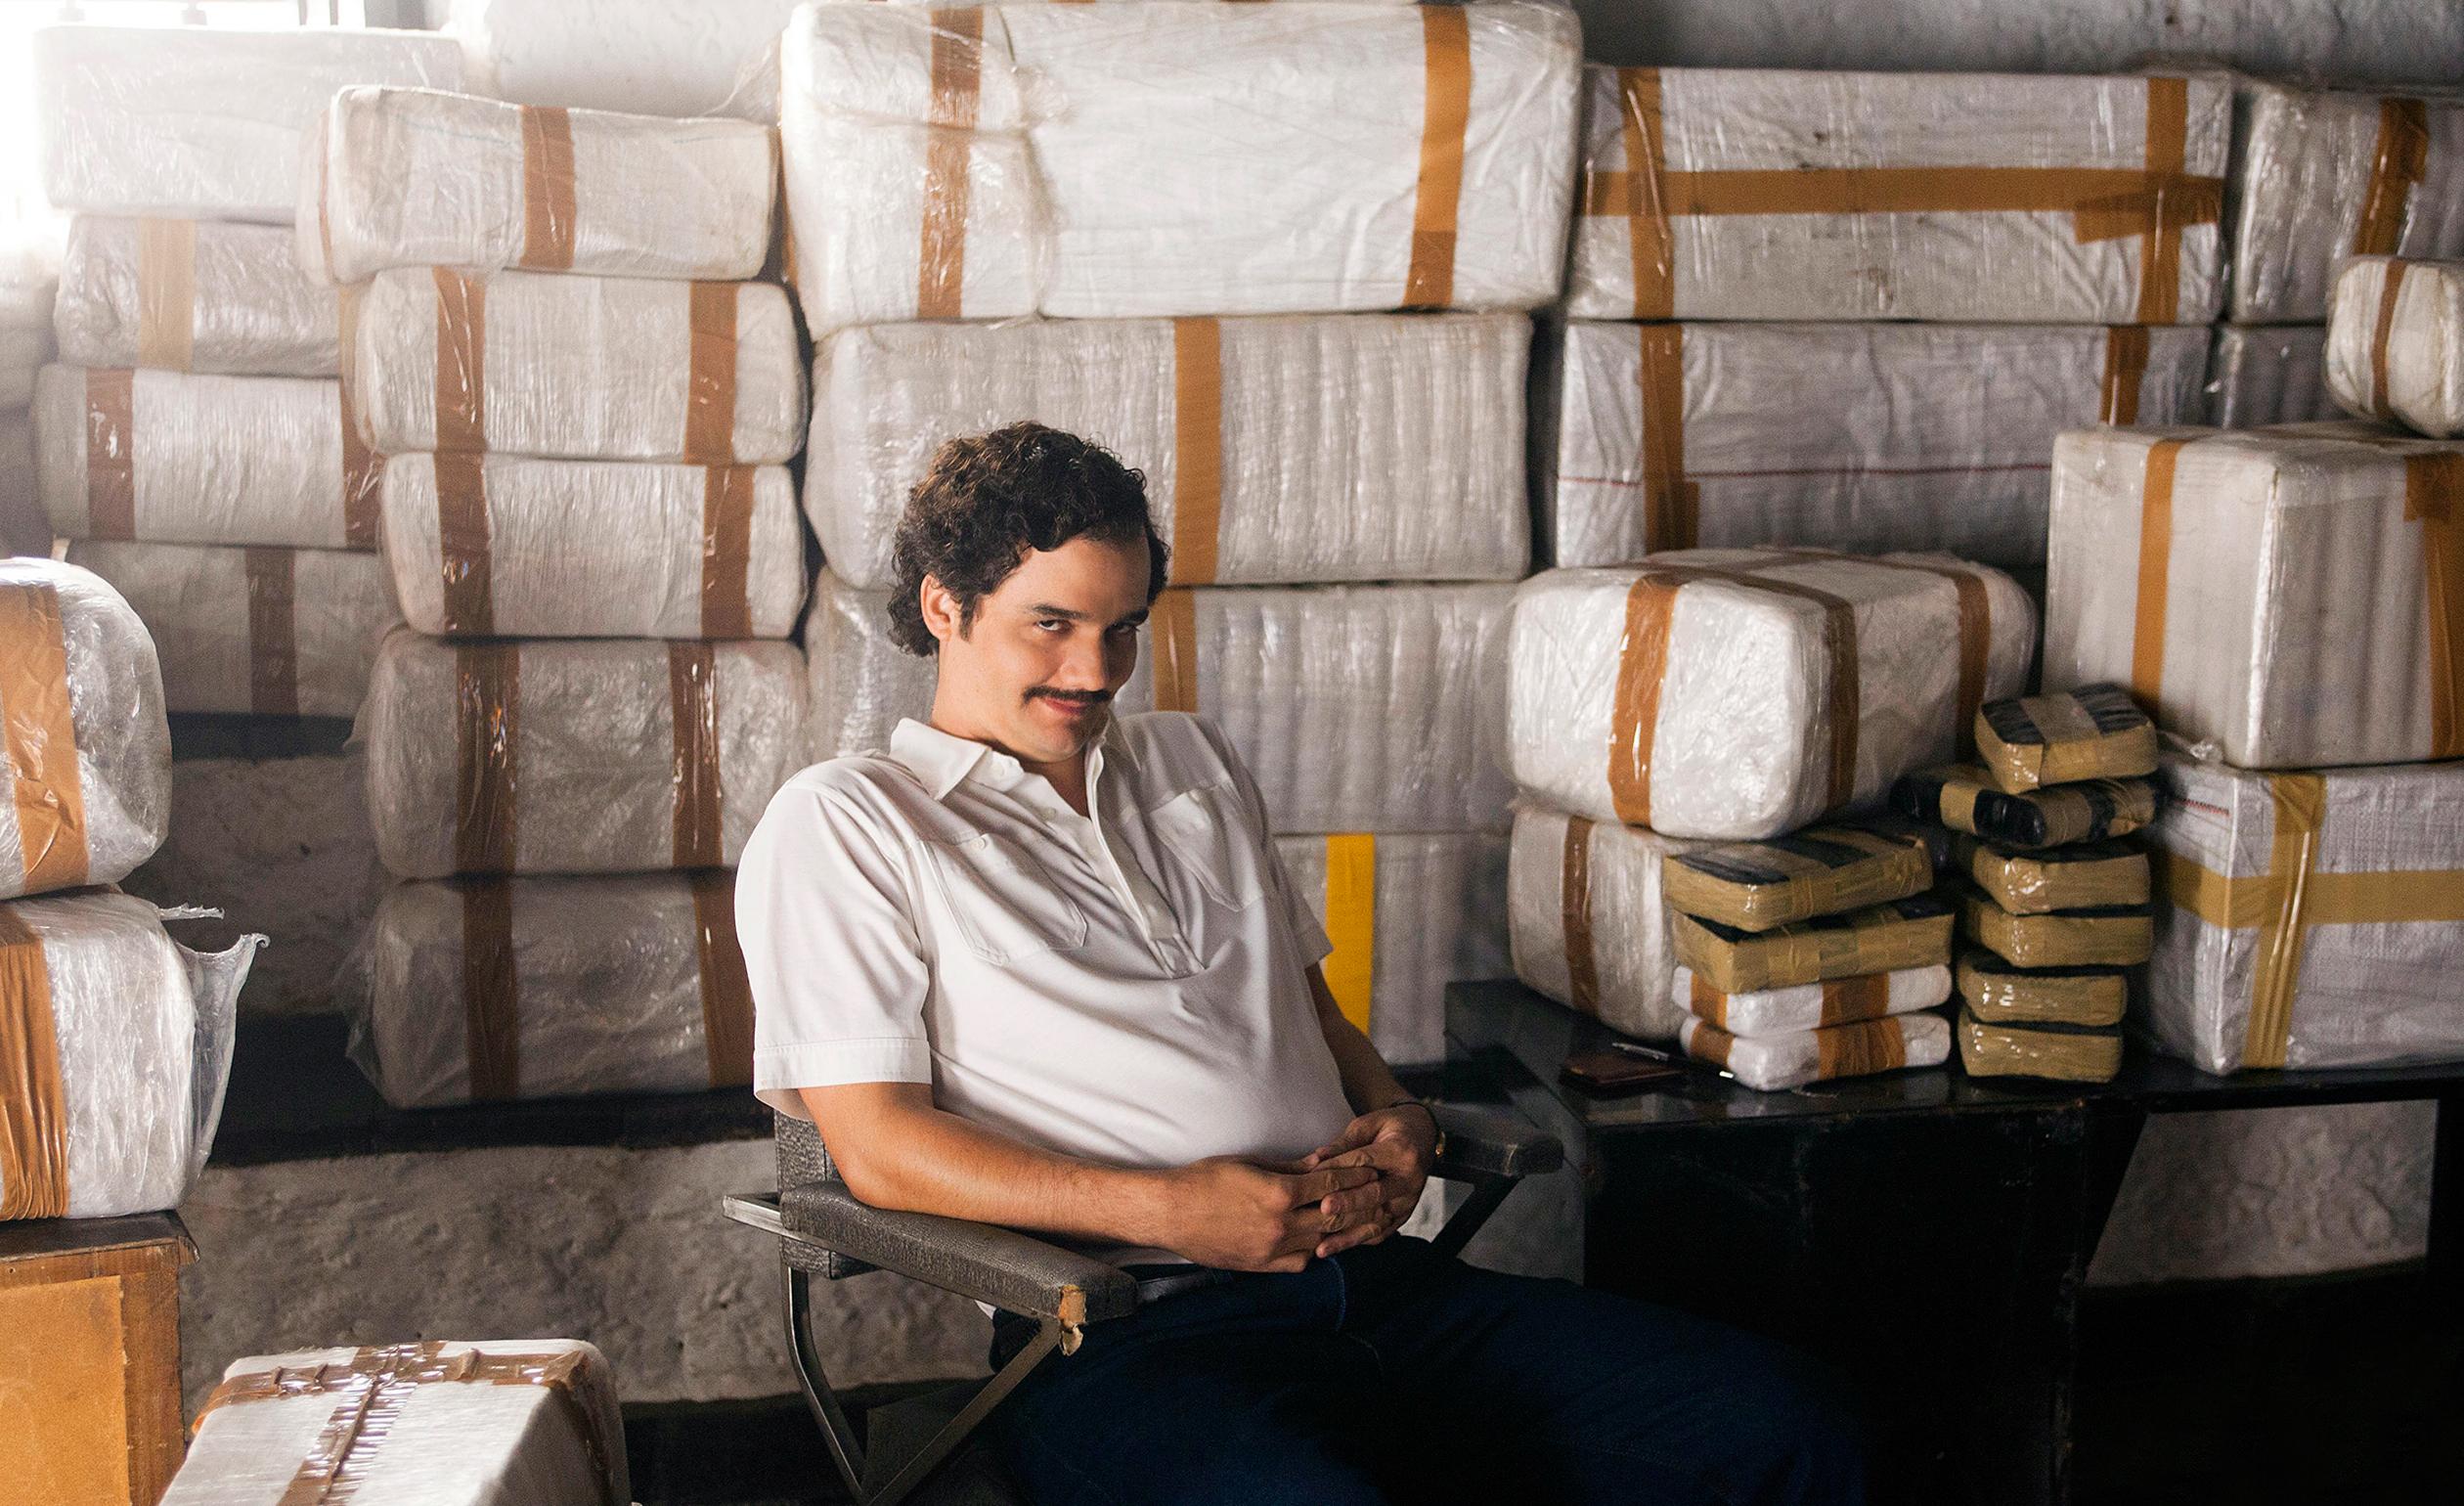 Wagner Moura portrays Pablo Escobar in Netflix's original series Narcos.